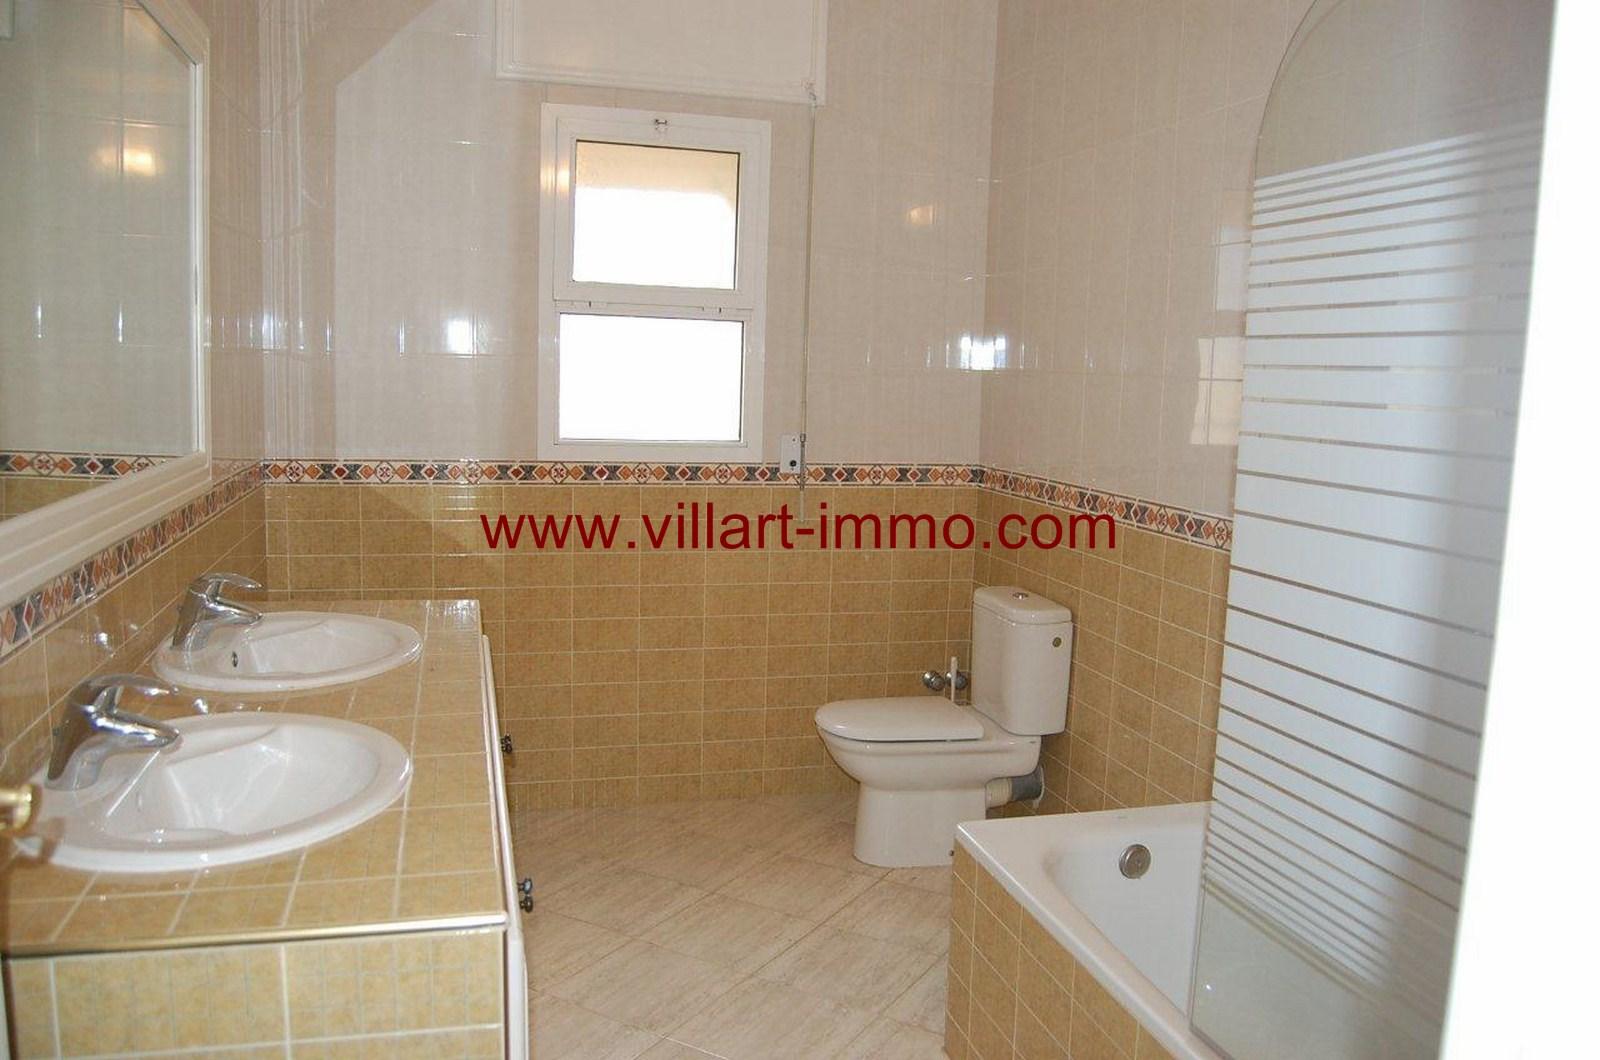 11-vente-villa-tanger-malabata-salle-de-bain-1-va362-villart-immo